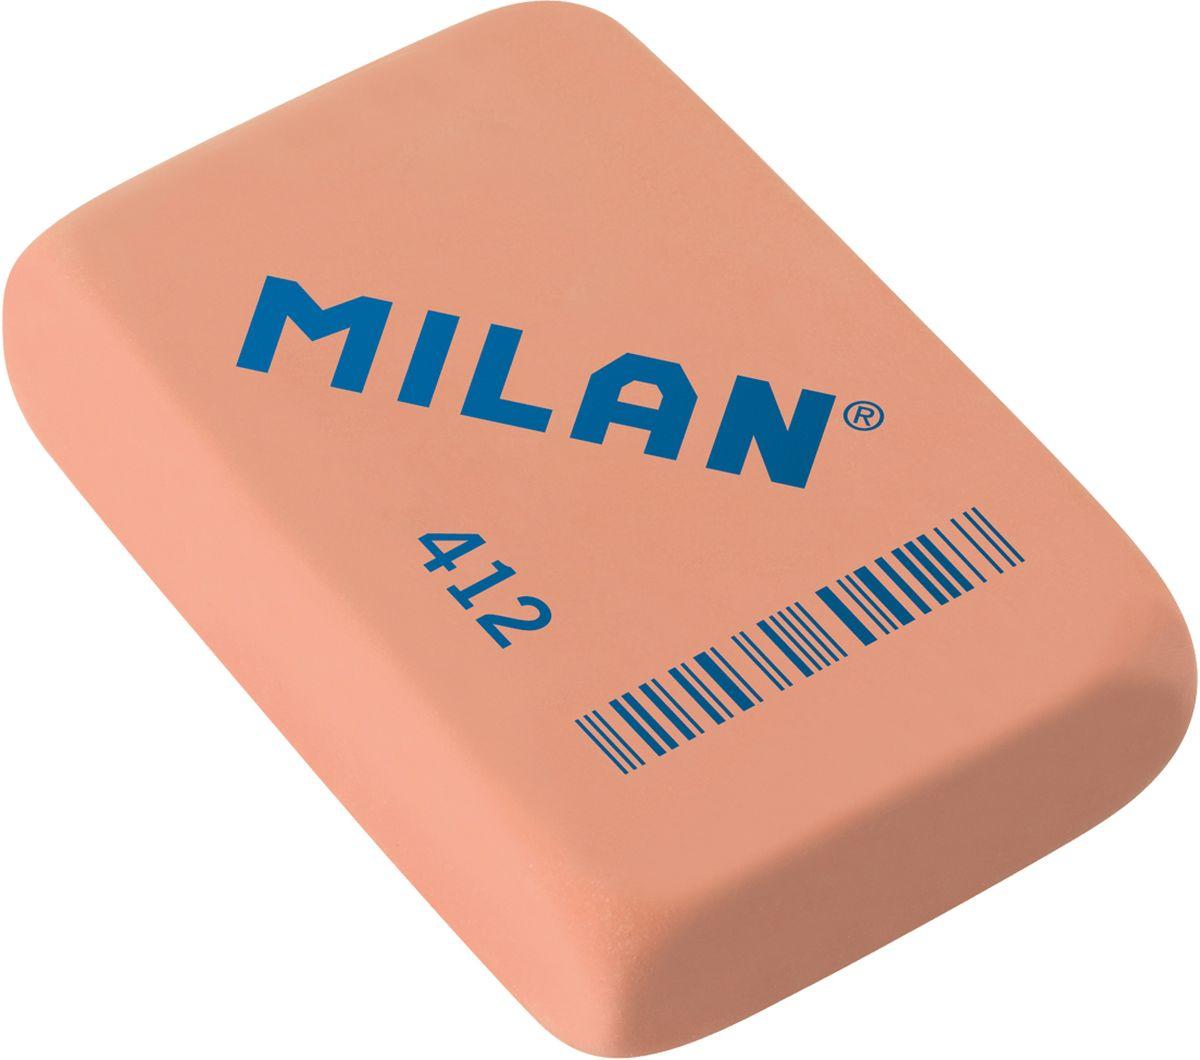 Milan Ластик 412 цвет светло-коралловый